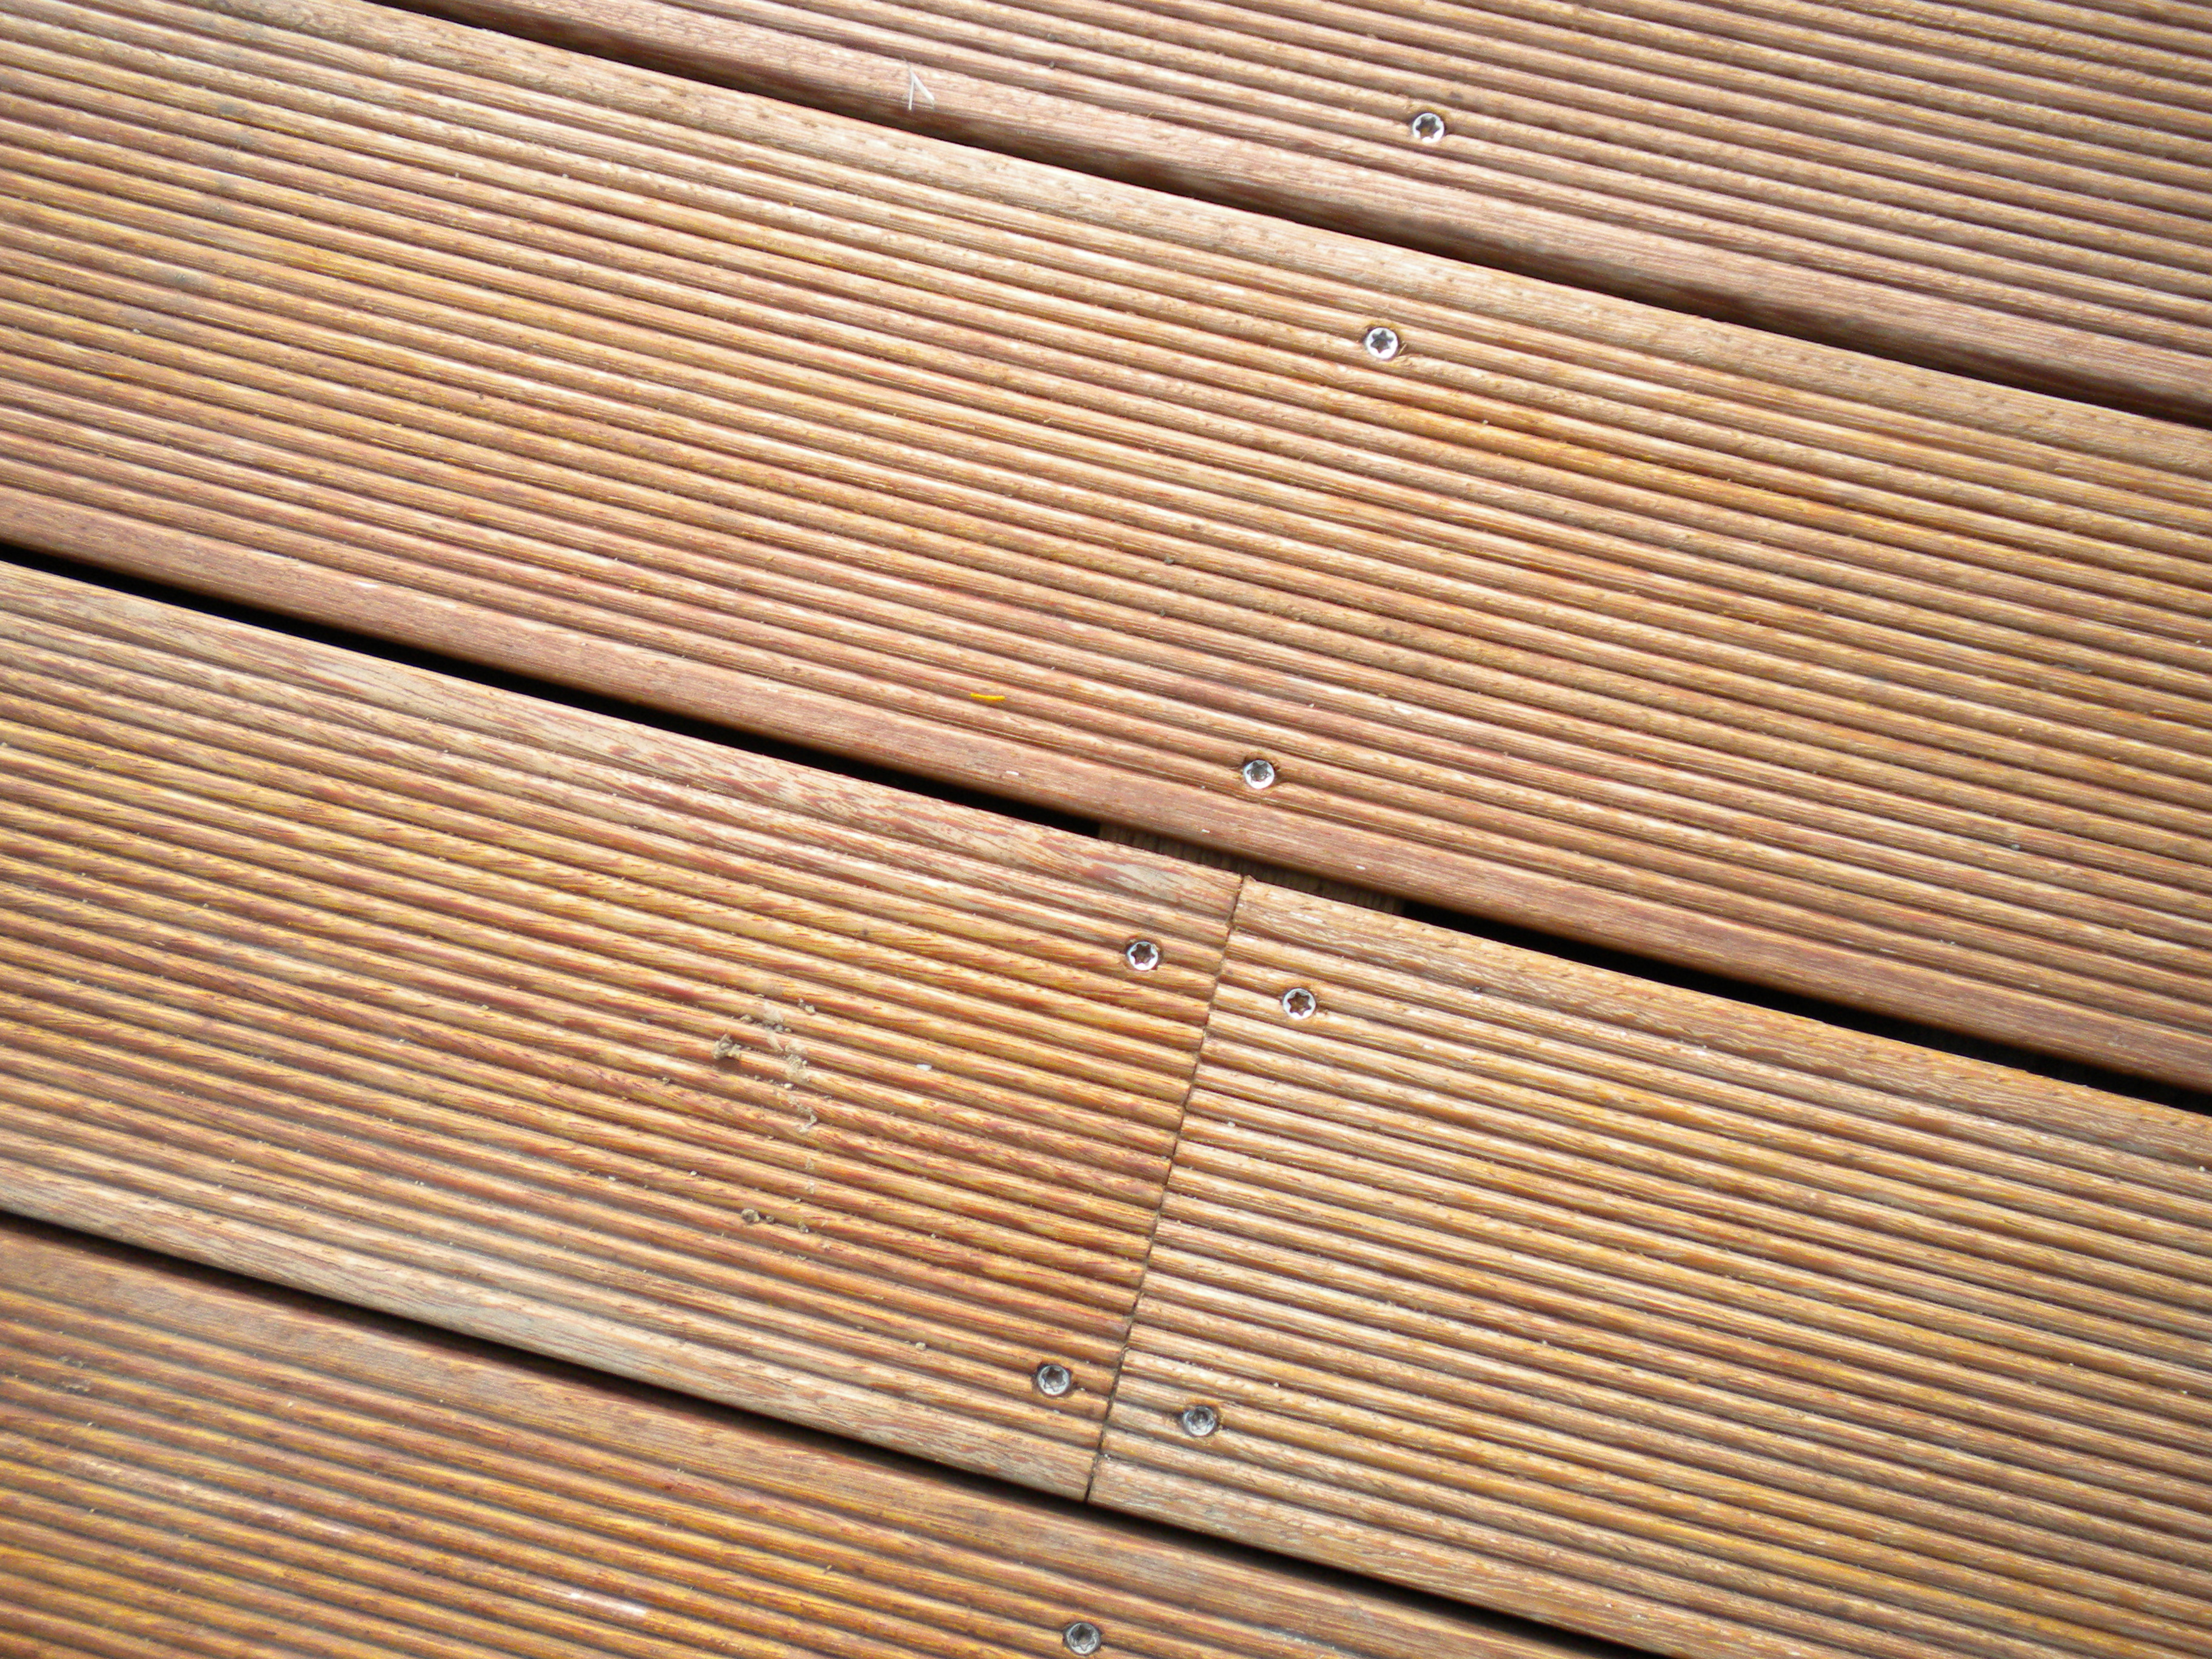 Deck-uri lemn - Angelim Pedra SELVA FLOORS - Poza 86